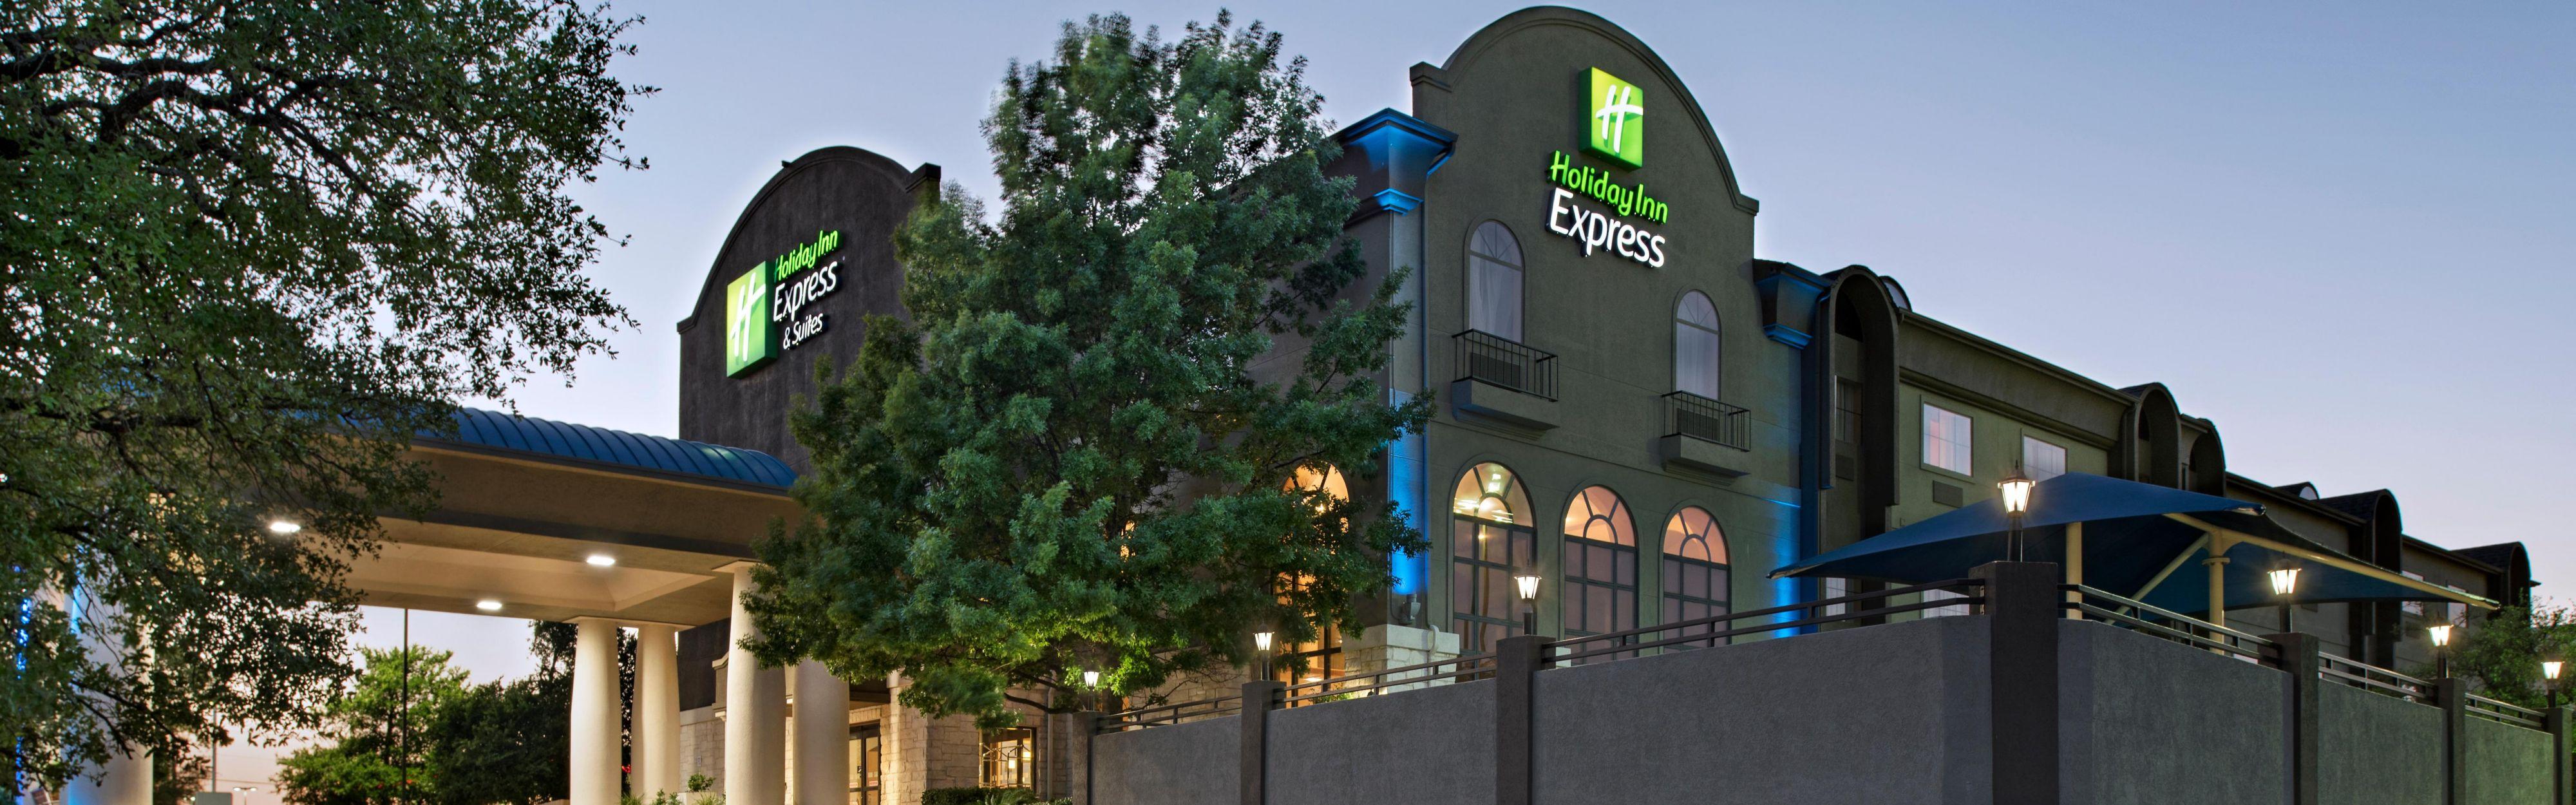 Holiday Inn Express & Suites Cedar Park (Nw Austin) image 0